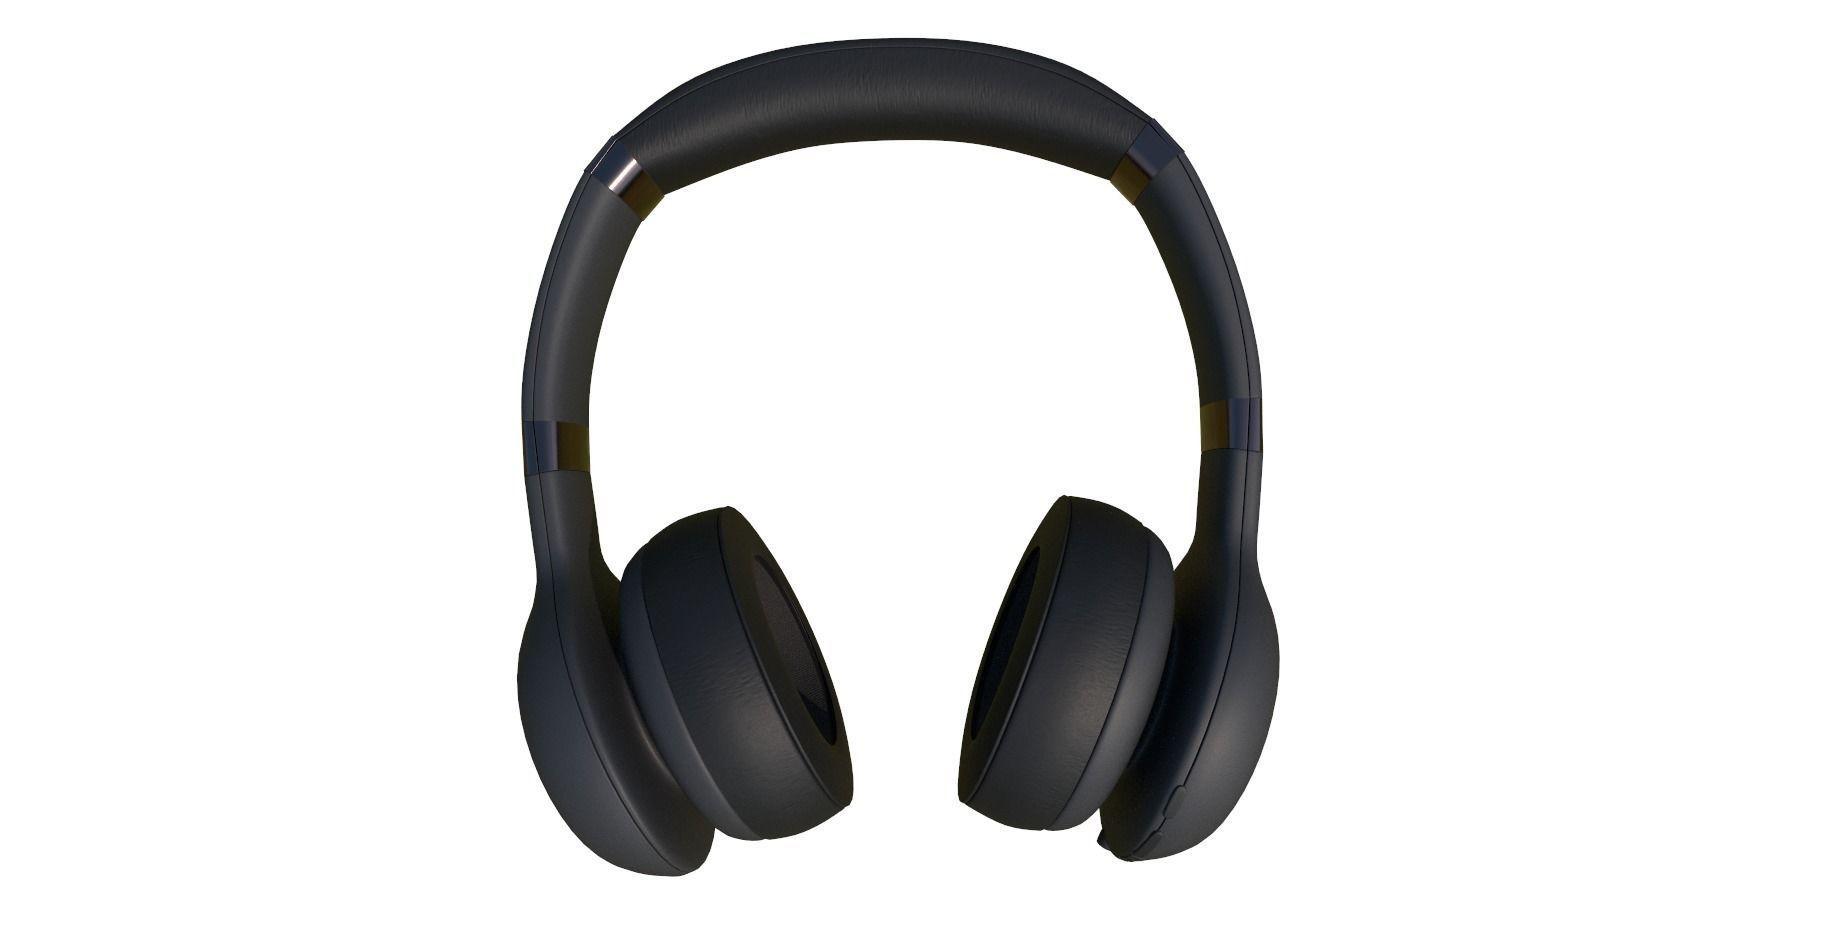 JBL Everest 310 Headphones